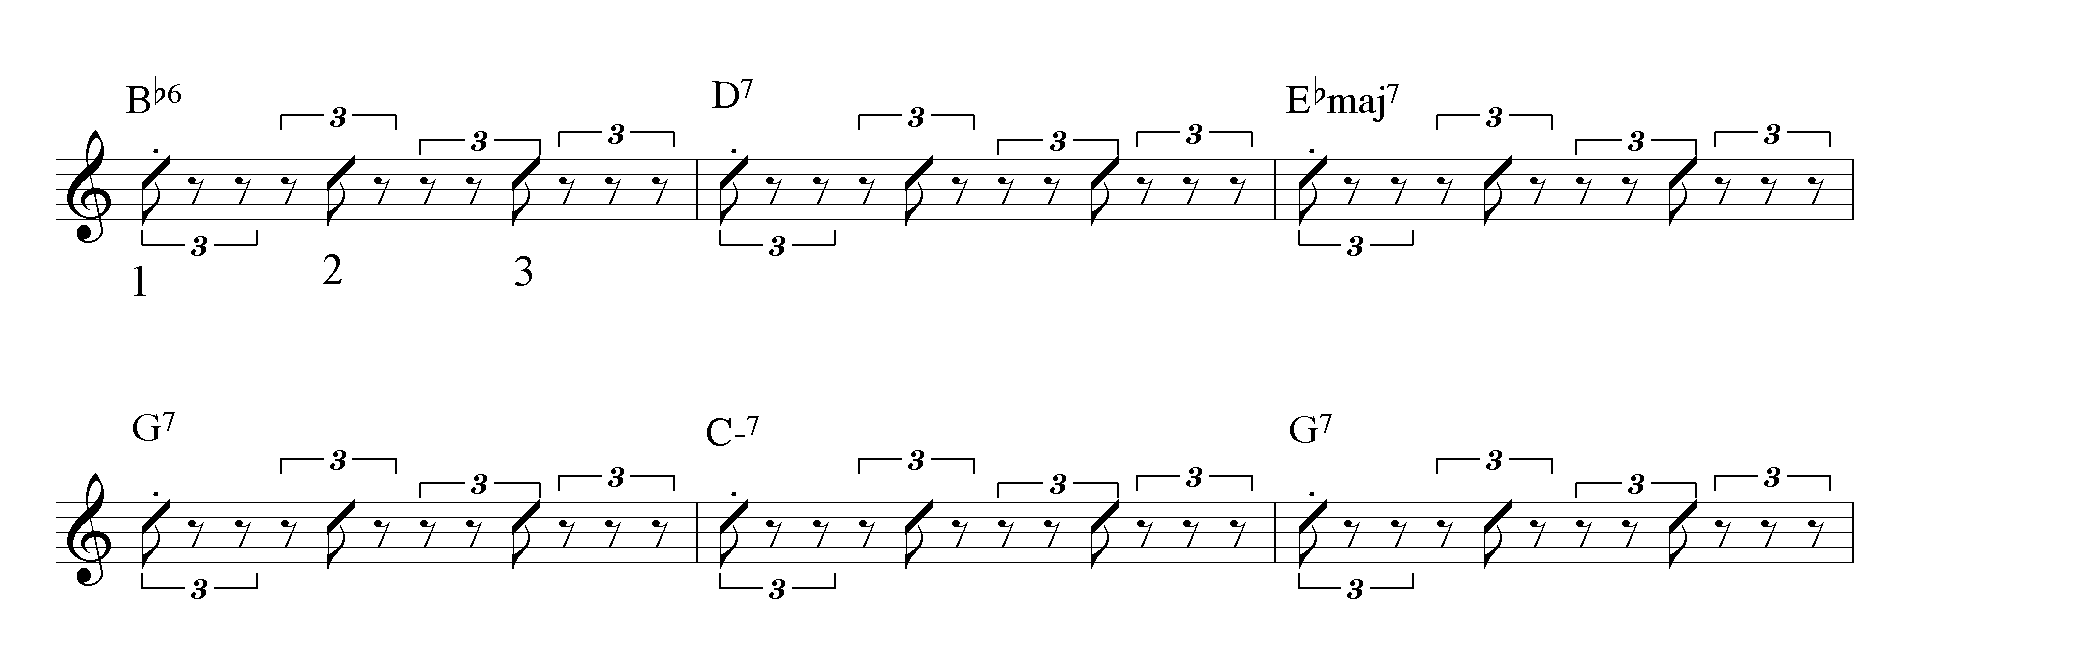 Guitar practice routine week 3 3 over 4 polyrhythm jamie guitar practice routine week 3 3 over 4 polyrhythm workout hexwebz Choice Image